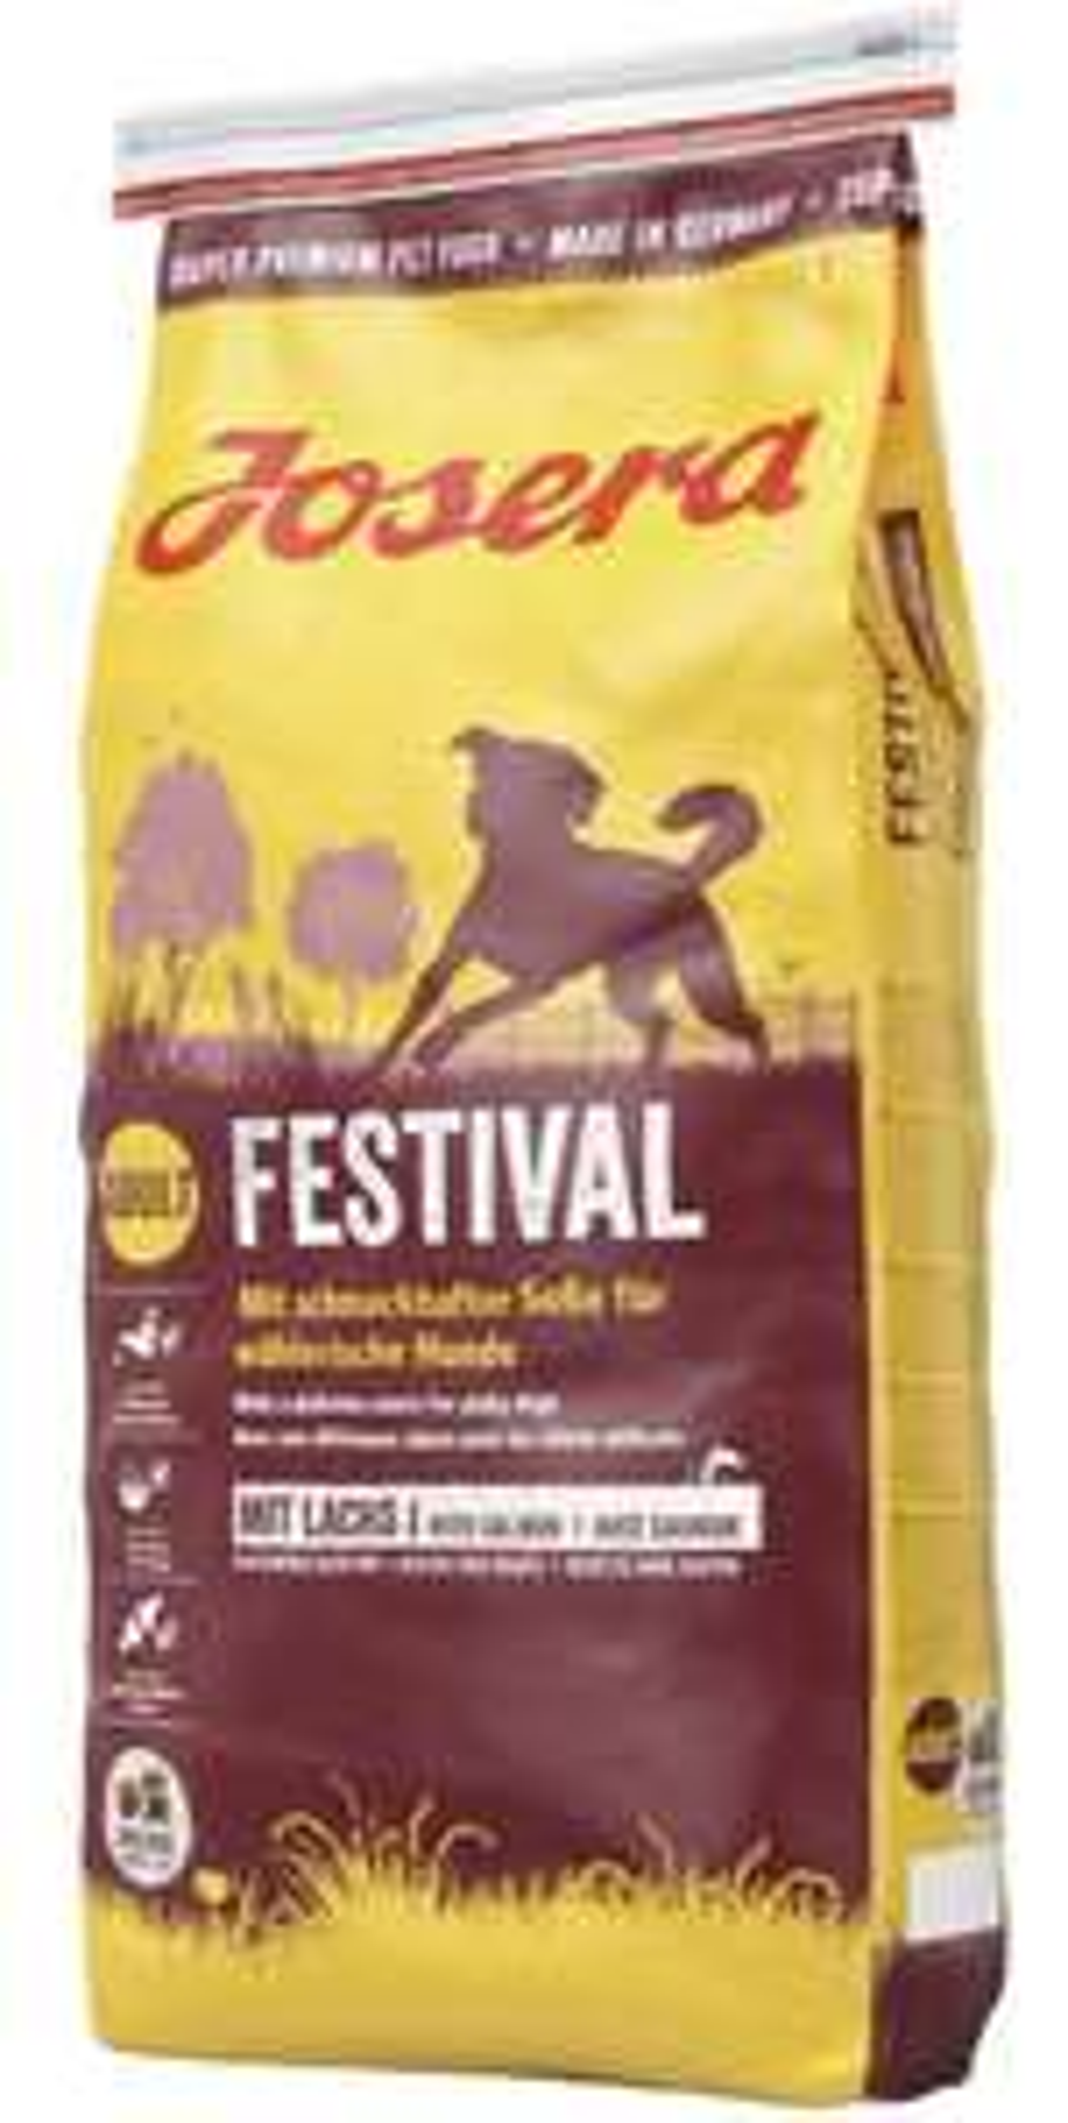 Josera Festival hochwertiges Hundfutter 4,5kg